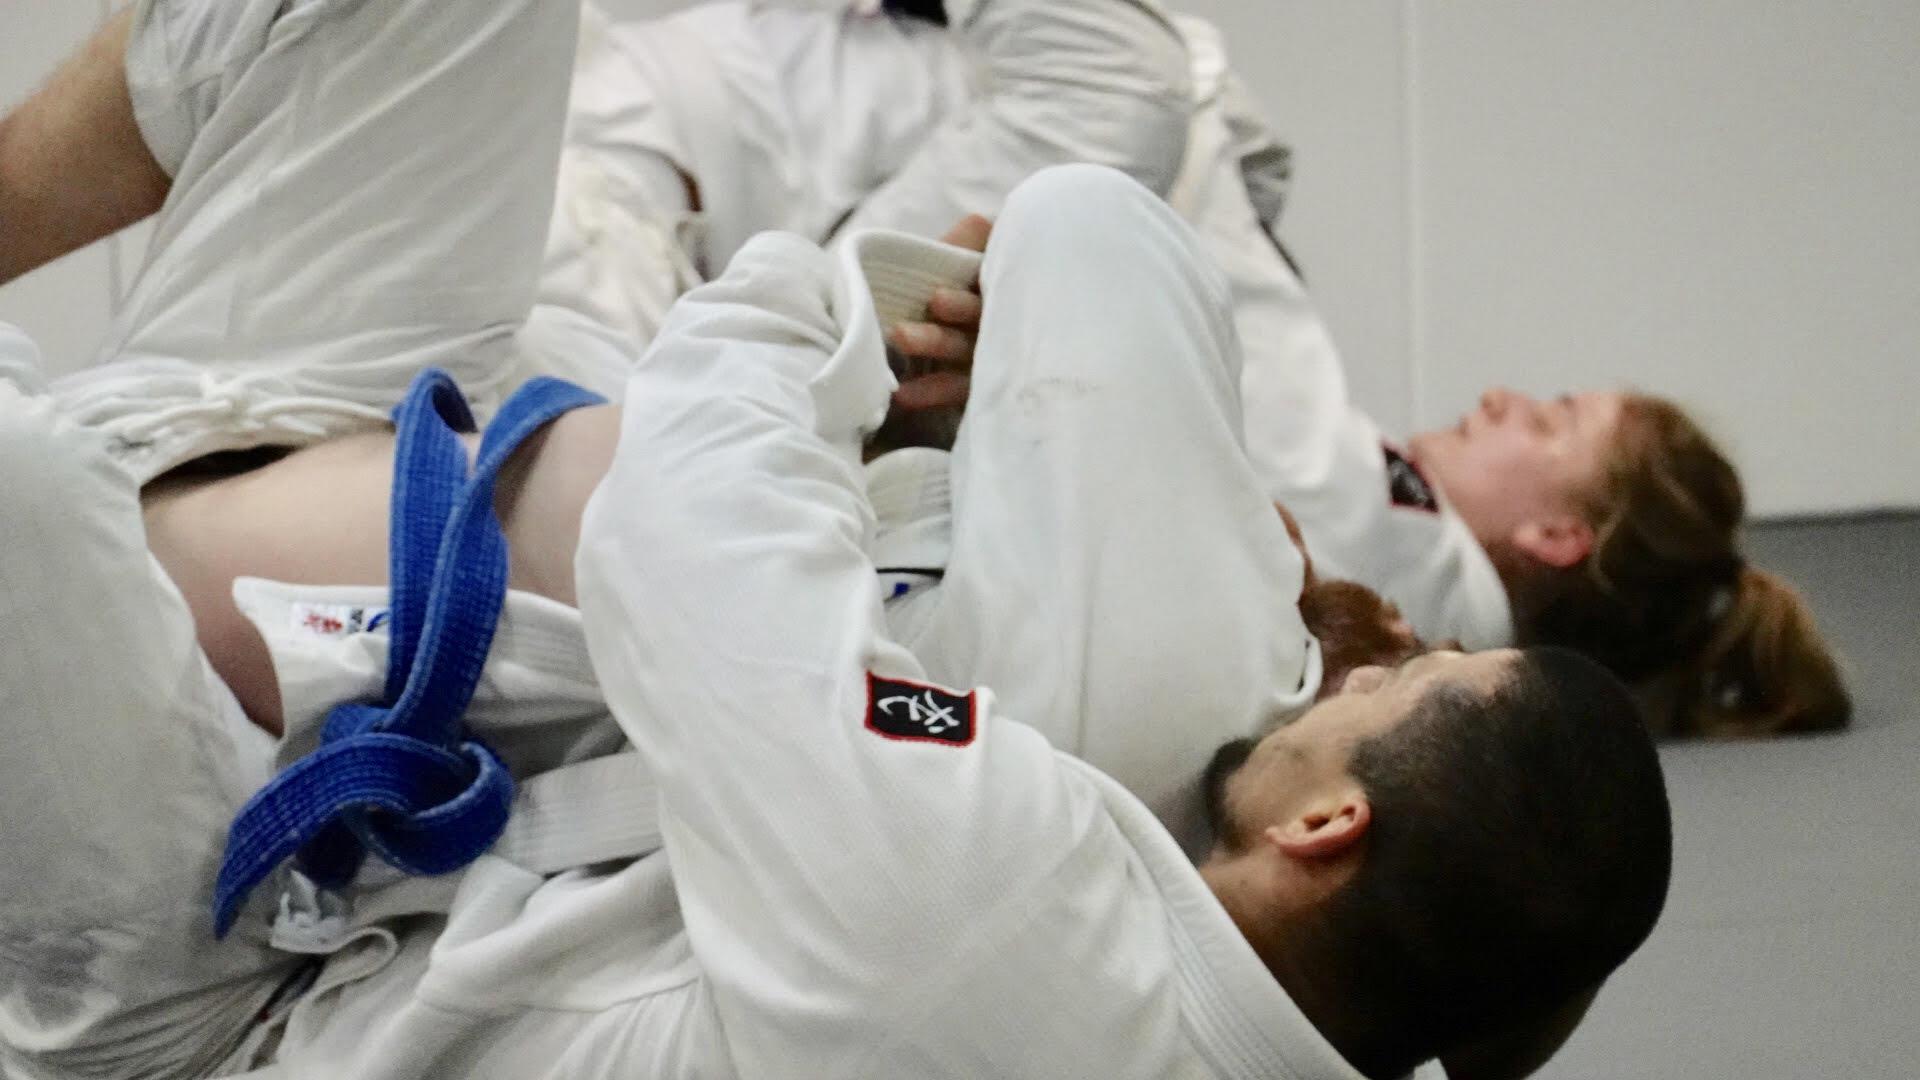 OZFit Brazilian Jiu Jitsu Classes in Bergen County - Gym in Waldwick NJ (6).jpg